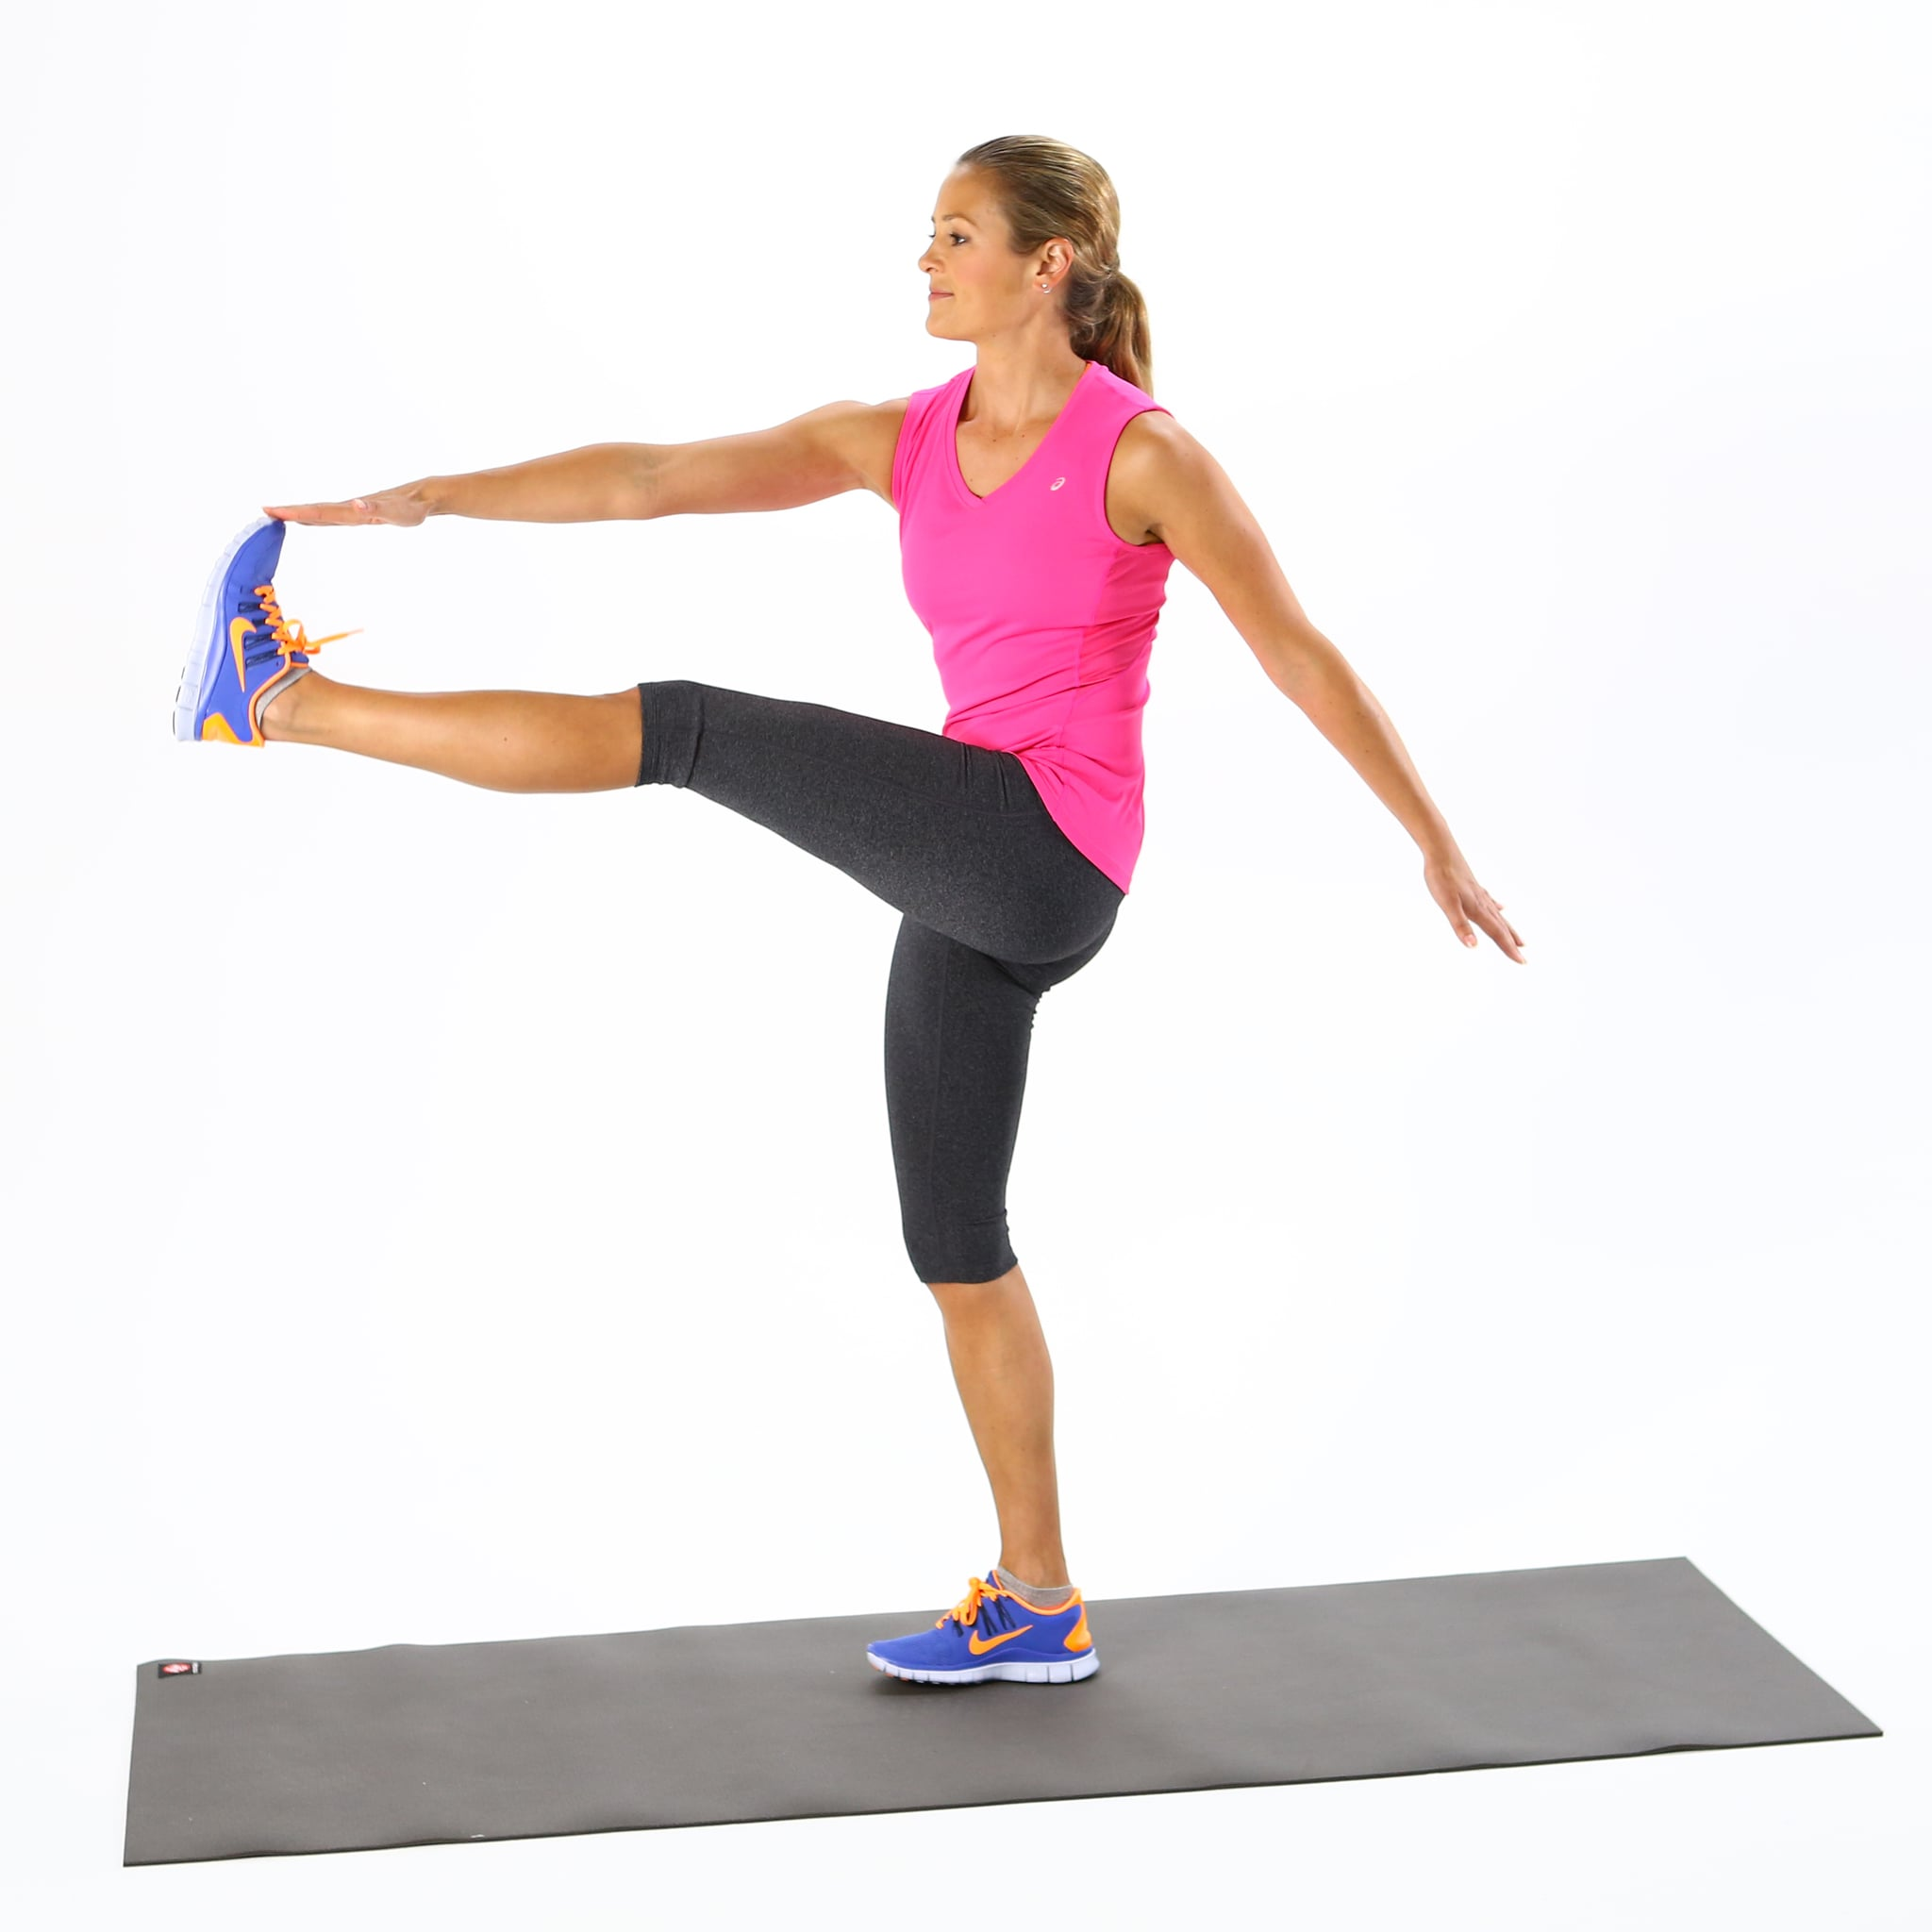 5-Minute Cardio Warmup | POPSUGAR Fitness